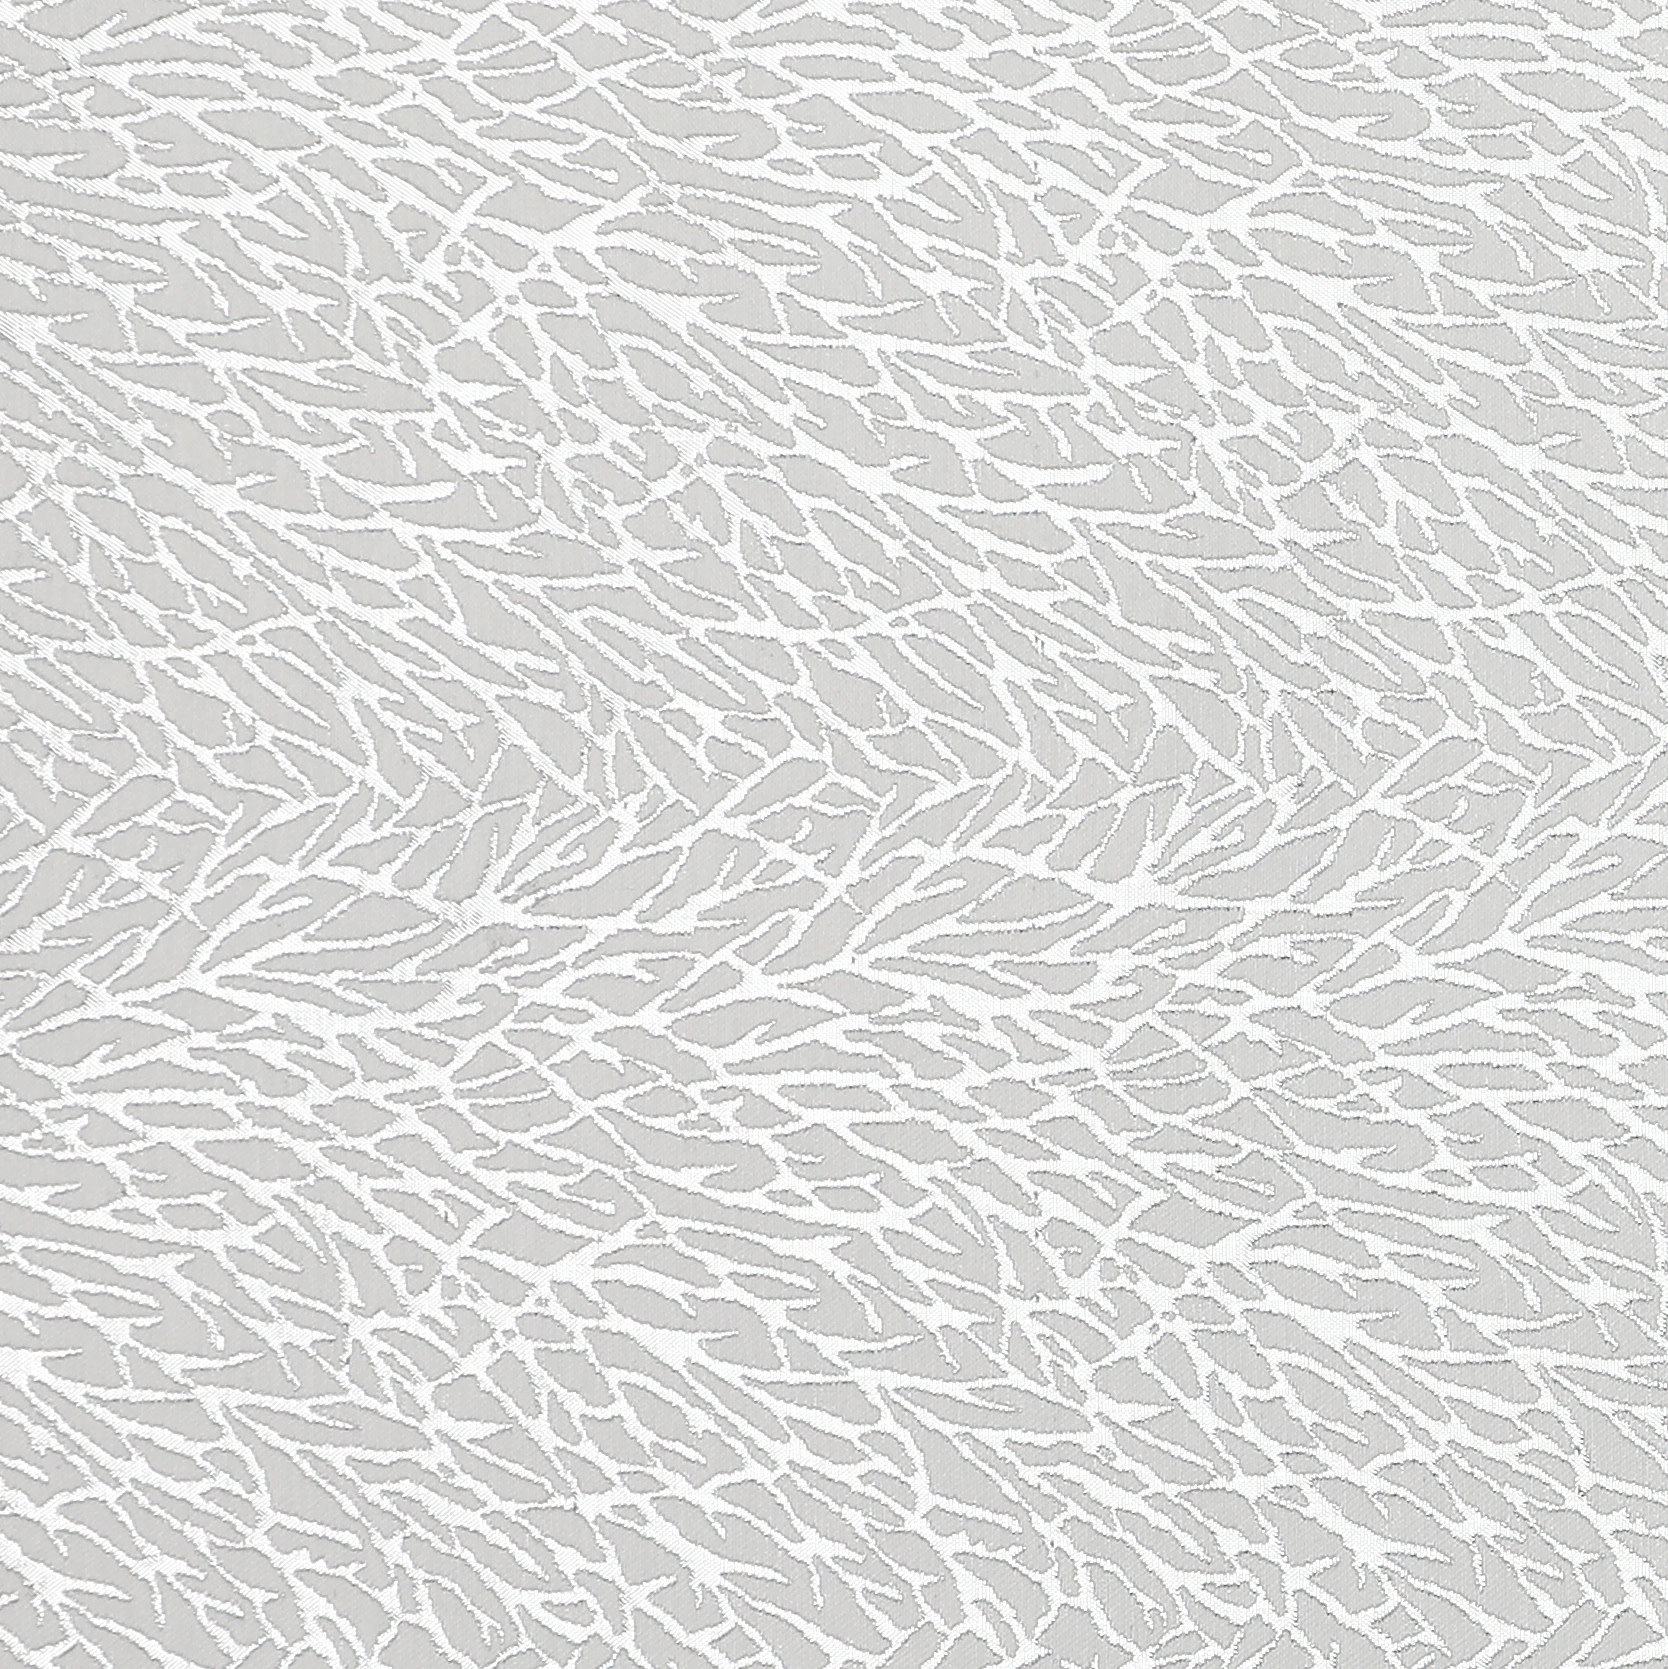 TC1341- 70 x 144 Jacquard Silver Frost Tablecloth